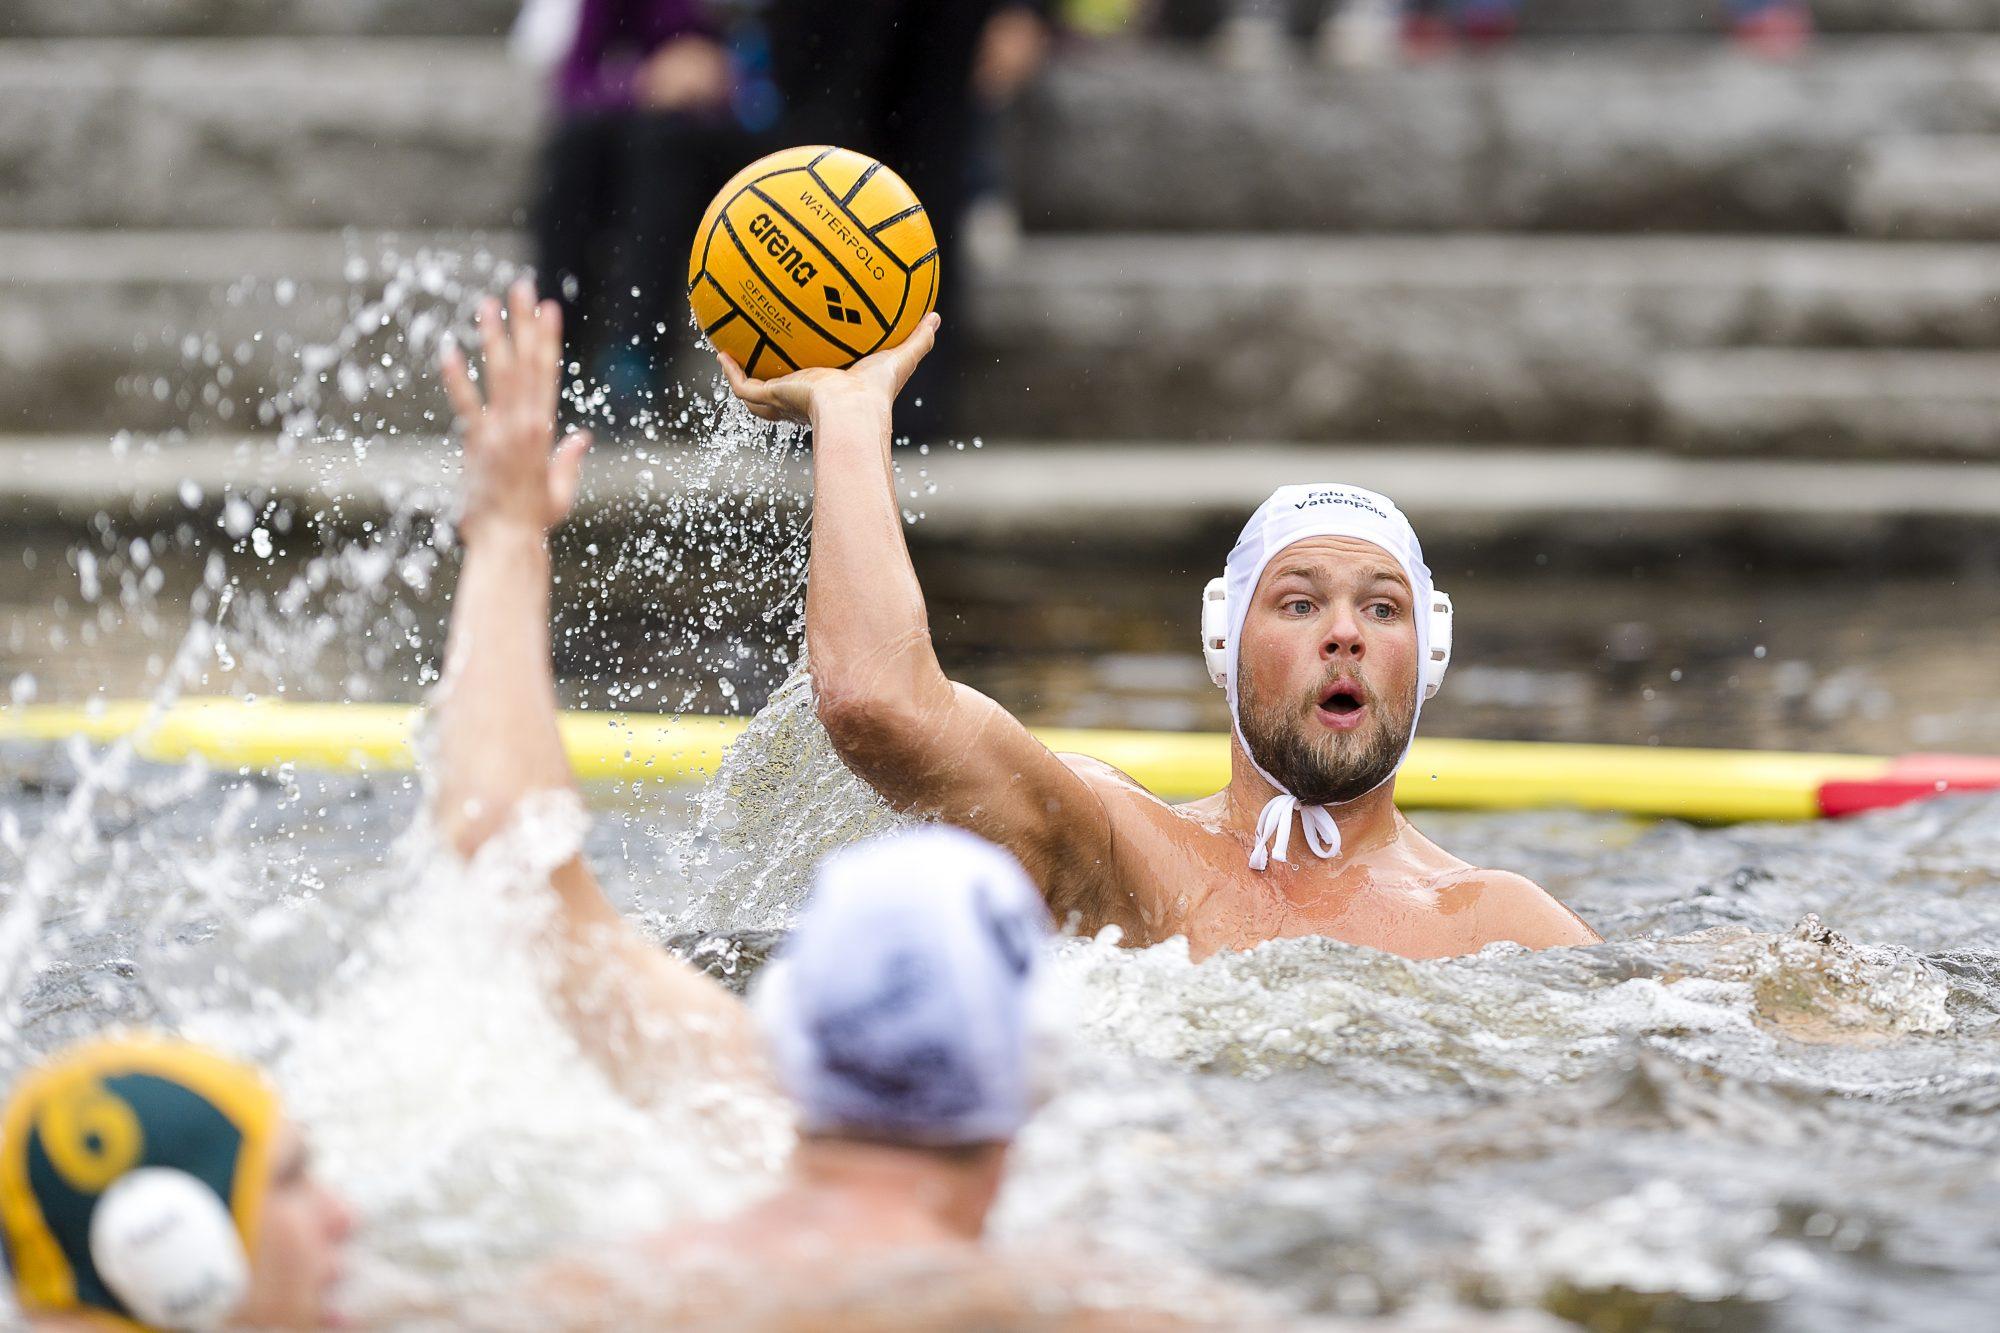 Match i beachvattenpolo under dag 1 i SM-veckan 2017 den 30 juni 2017 i Borås